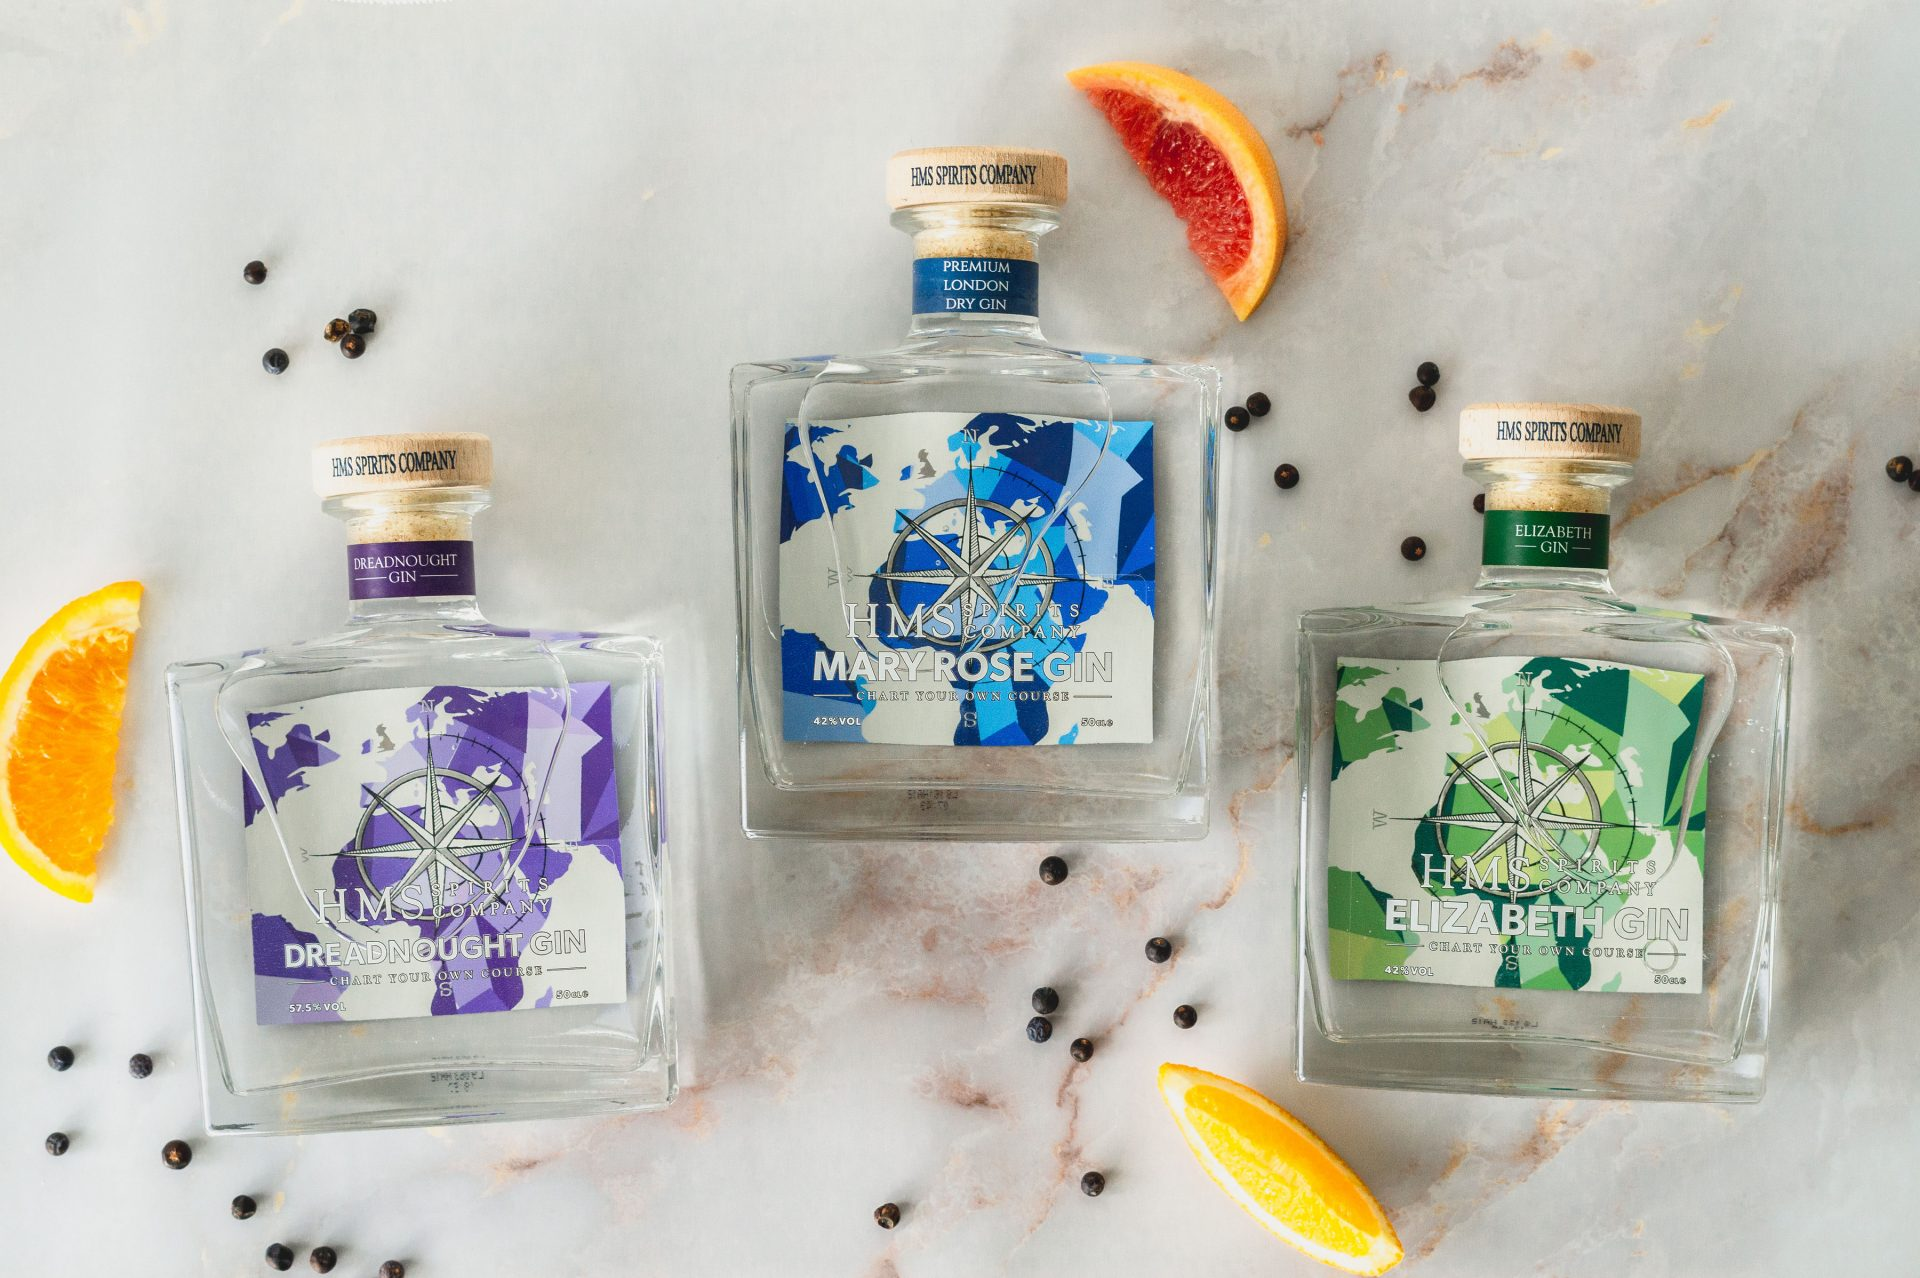 The HMS Spirits gin collection